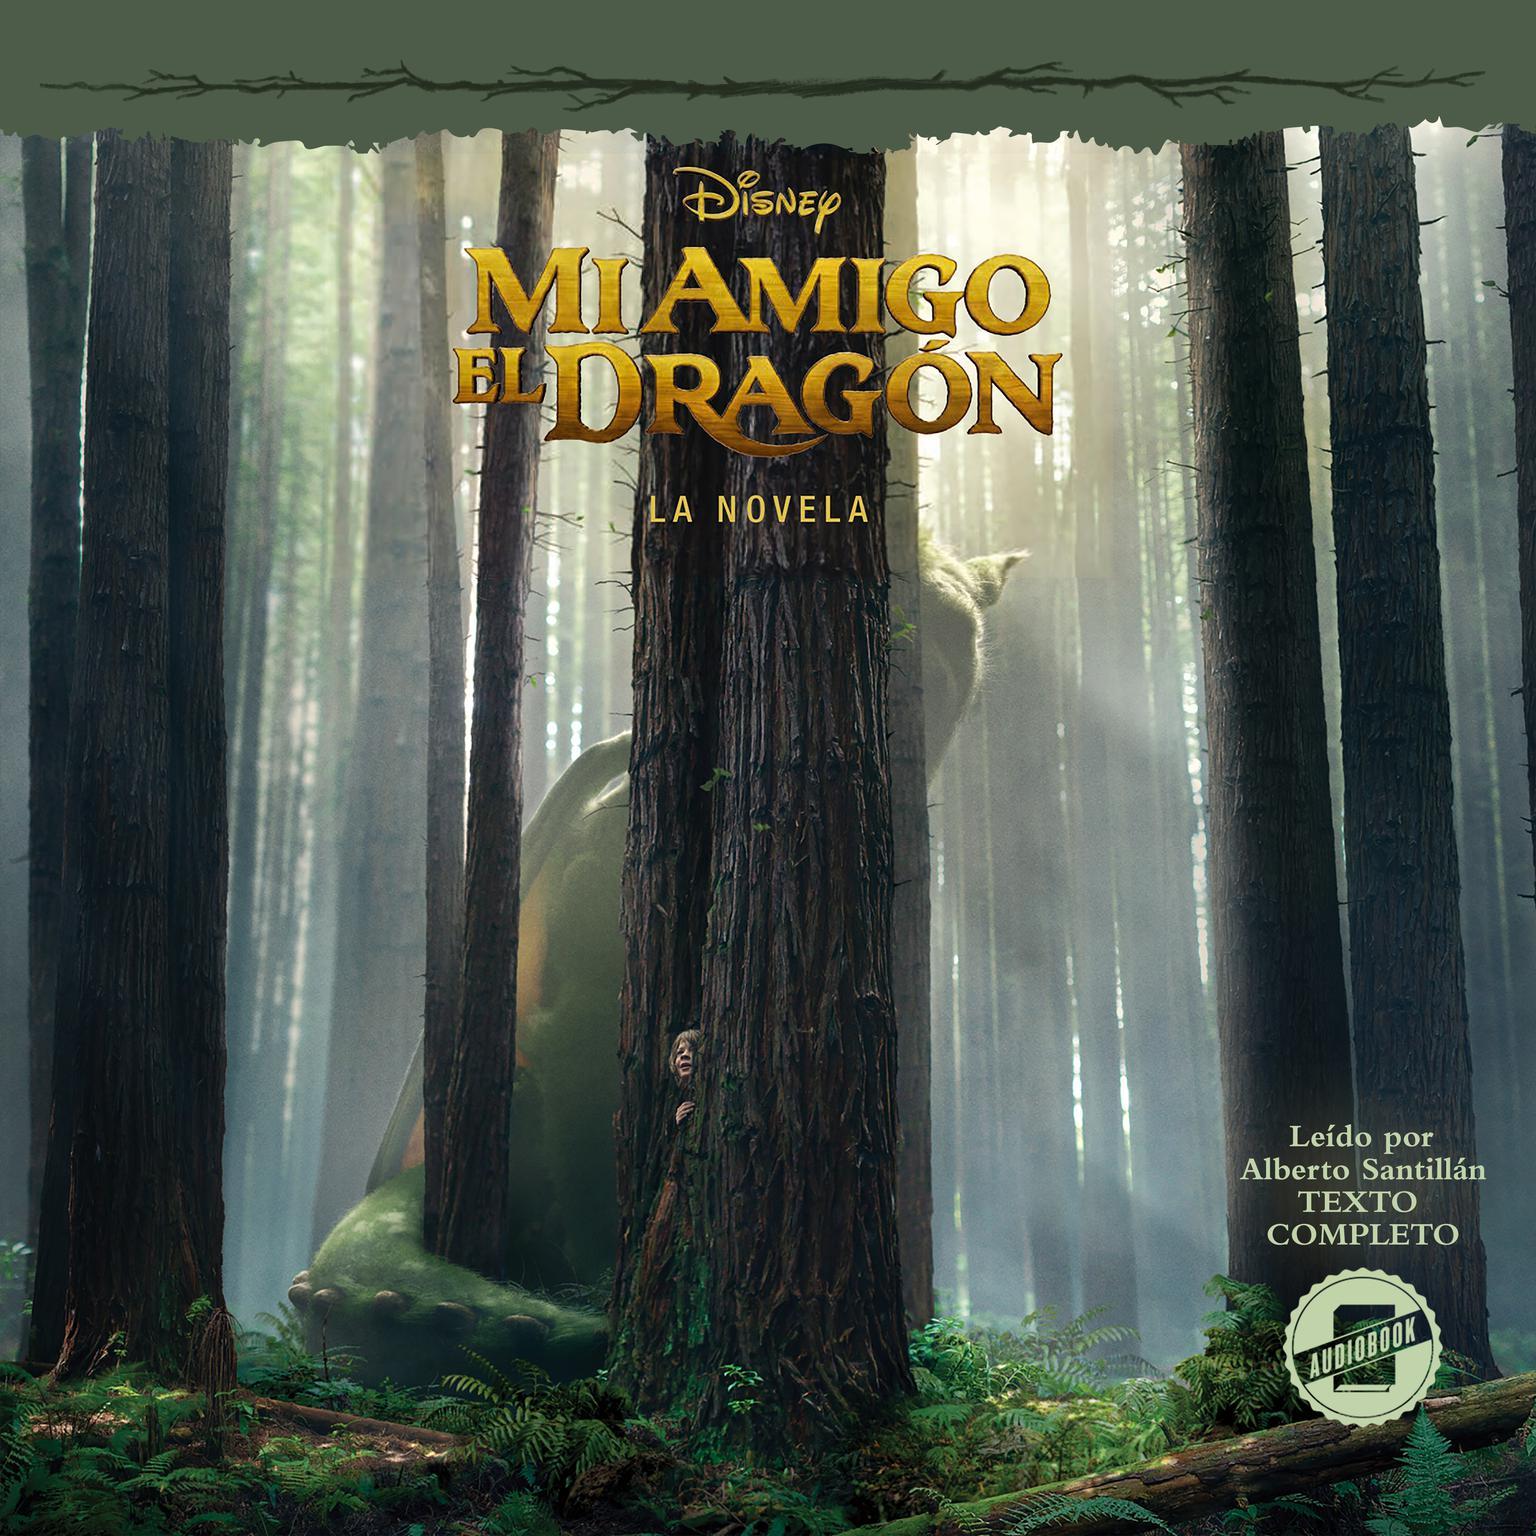 Printable Pete's Dragon (Spanish Edition): La Novela Audiobook Cover Art